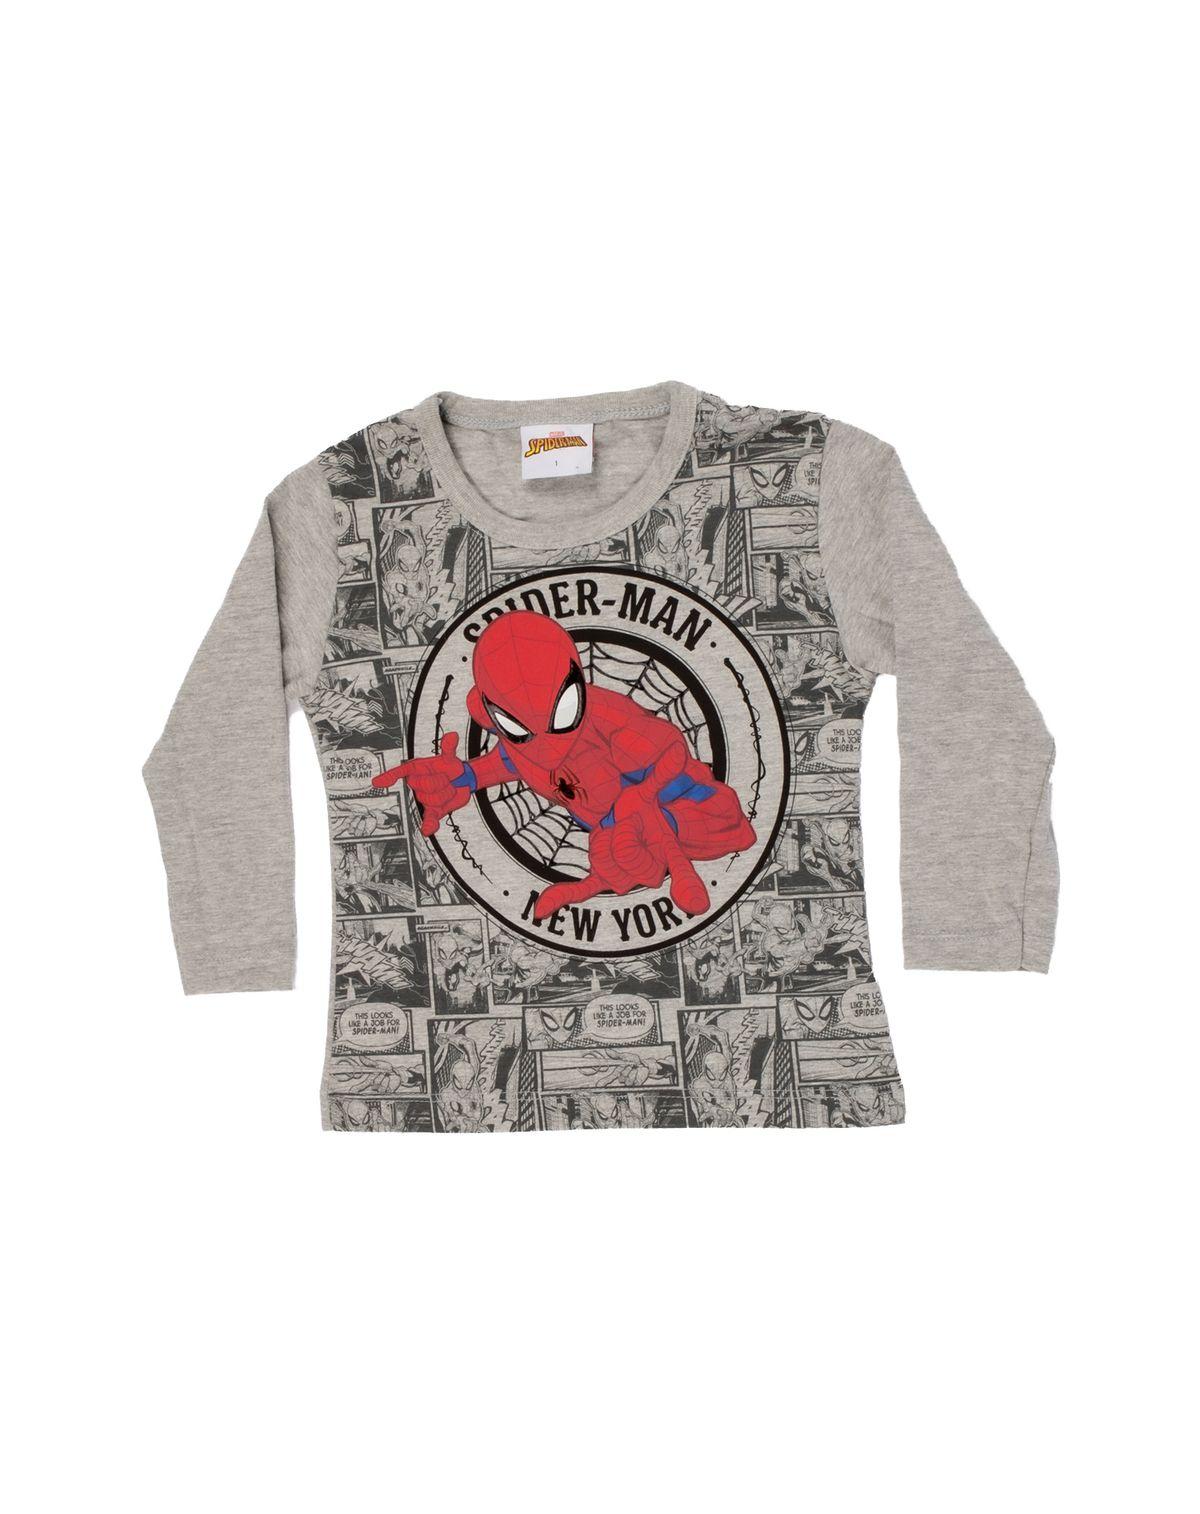 552039004-camiseta-manga-longa-bebe-menino-estampa-homem-aranha-mescla-1-ca1